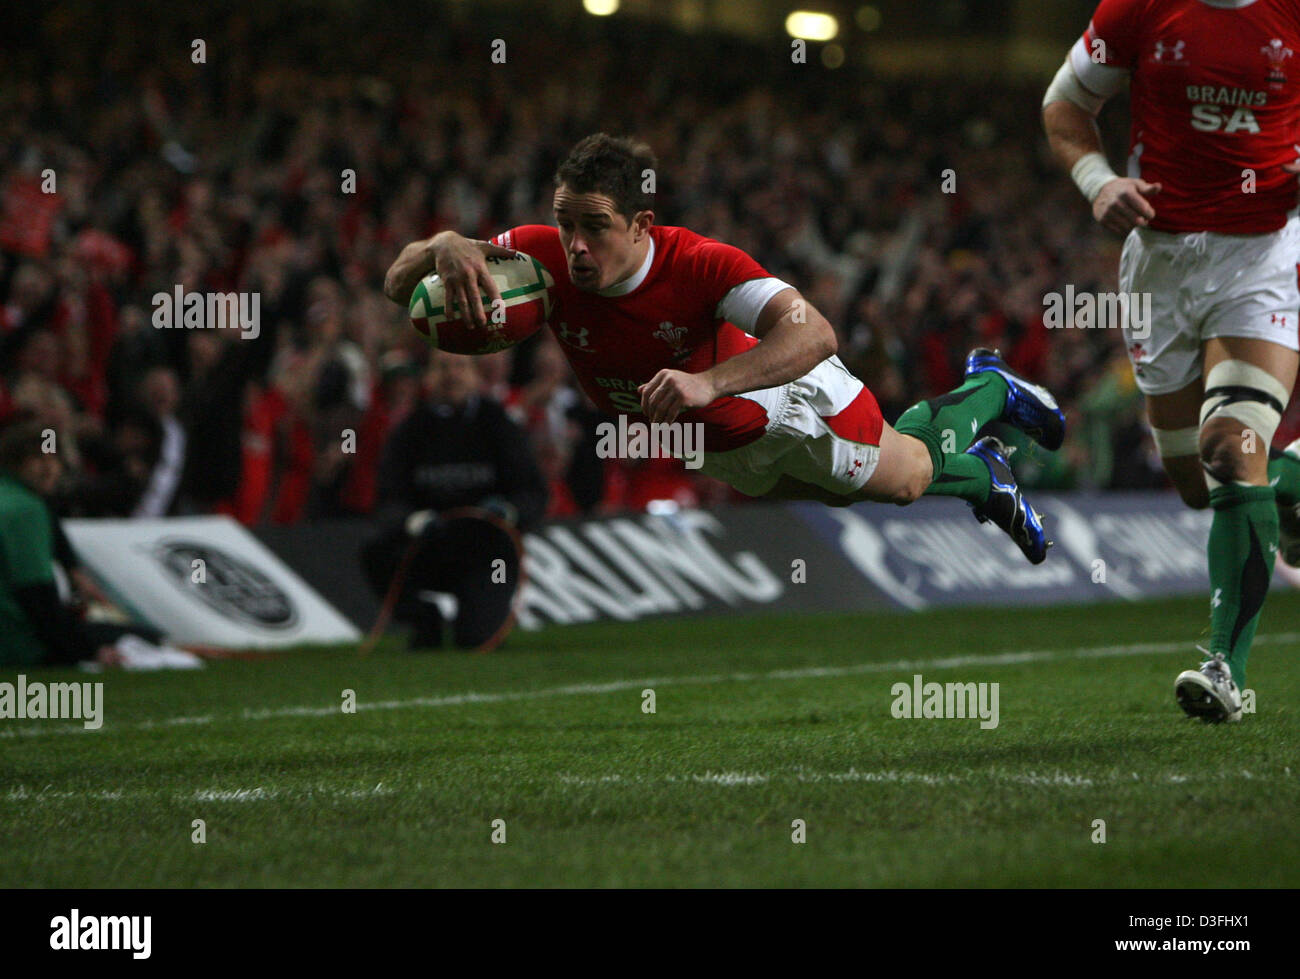 29.11.08. Invesco Perpetual series 2008. Wales v Australia. Millennium Stadium, Cardiff. Wales' Shane Williams - Stock Image